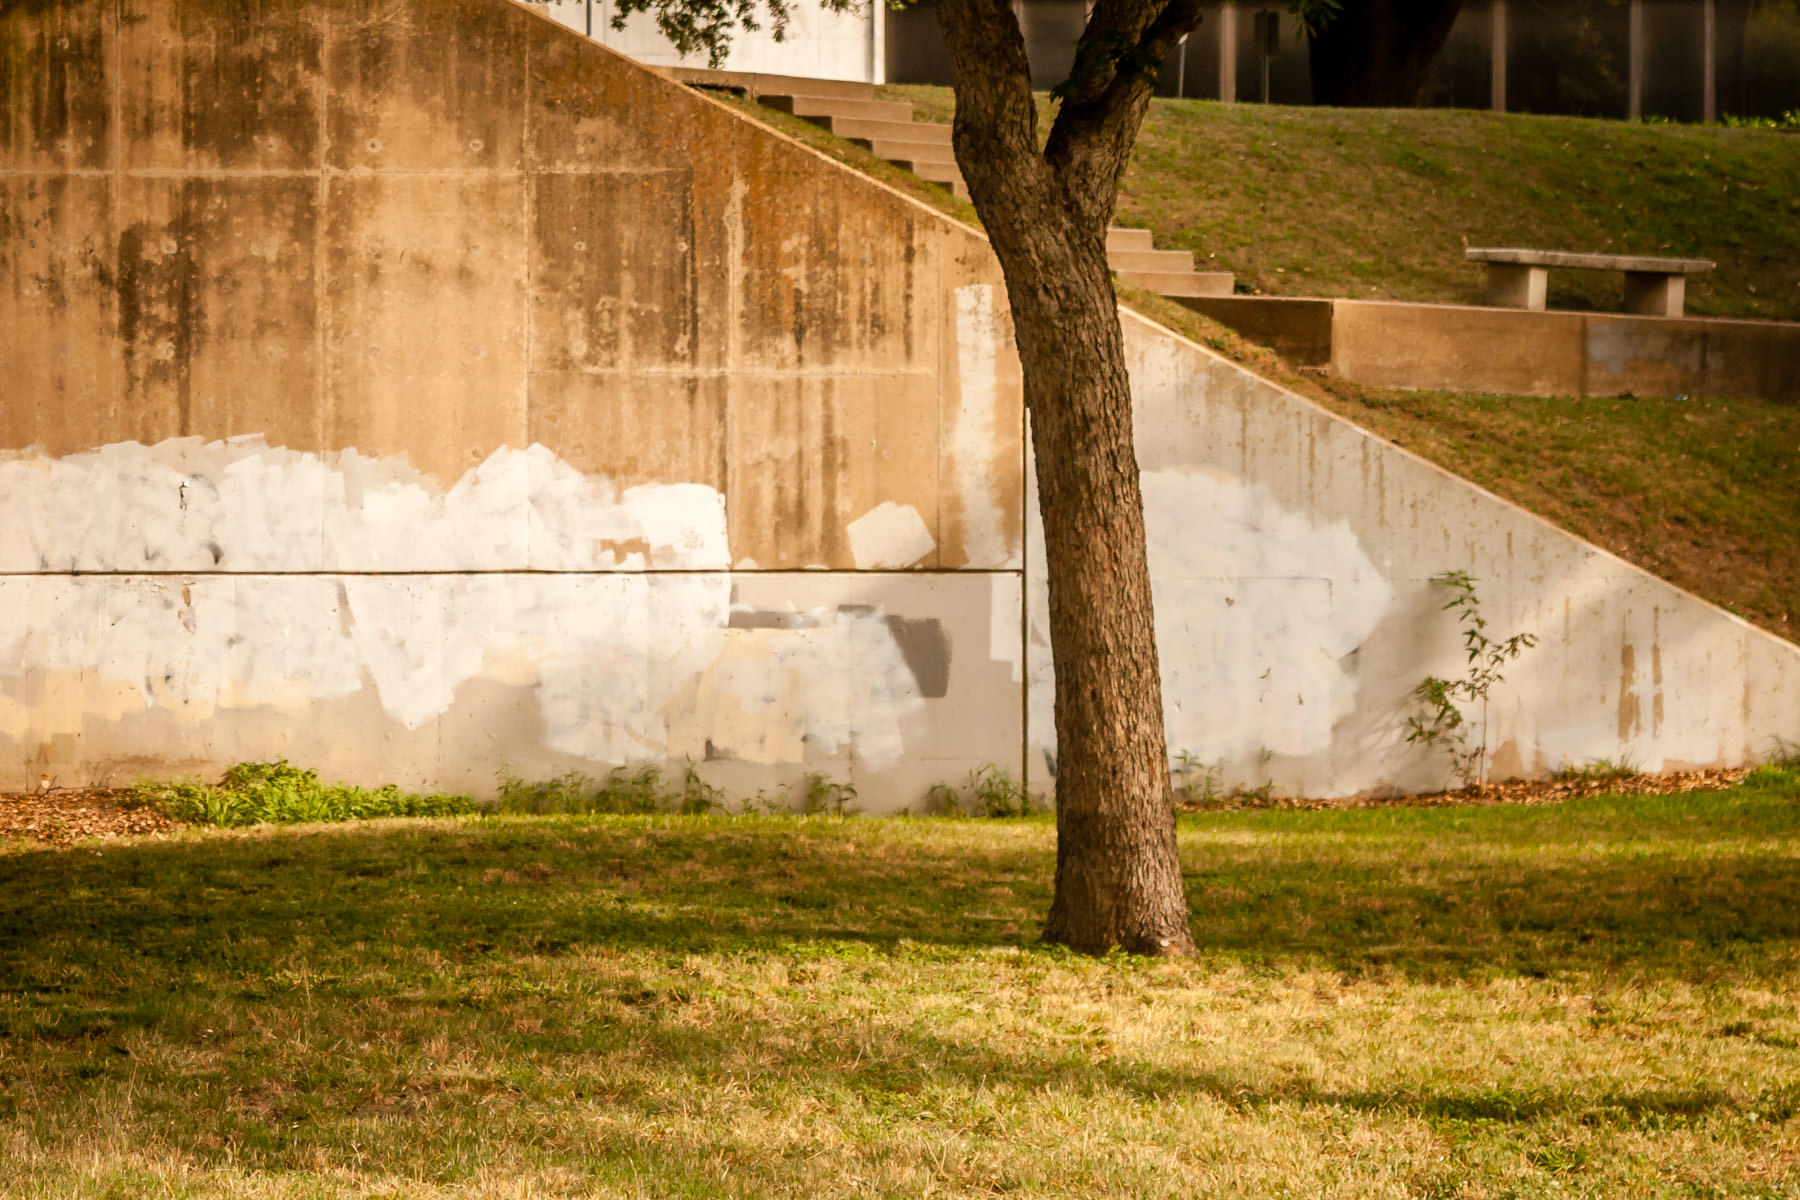 The morning sun lights a tree growing near a retaining wall along Dallas' Turtle Creek.